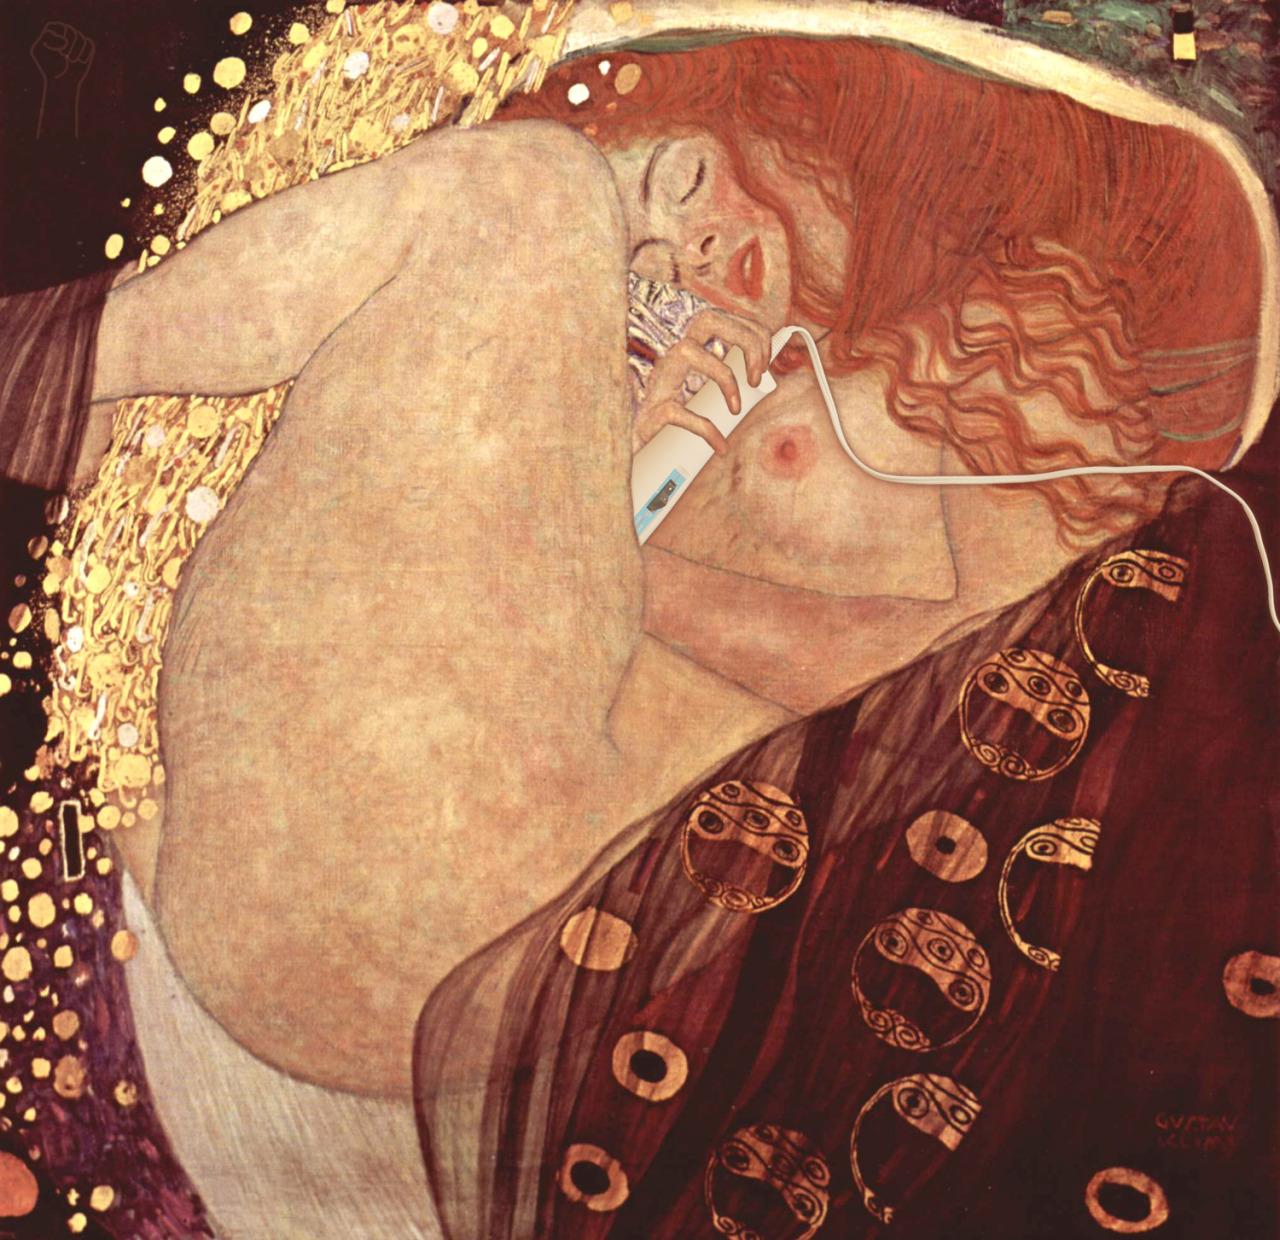 Danae with Magic Wand by Gustav Klimt.